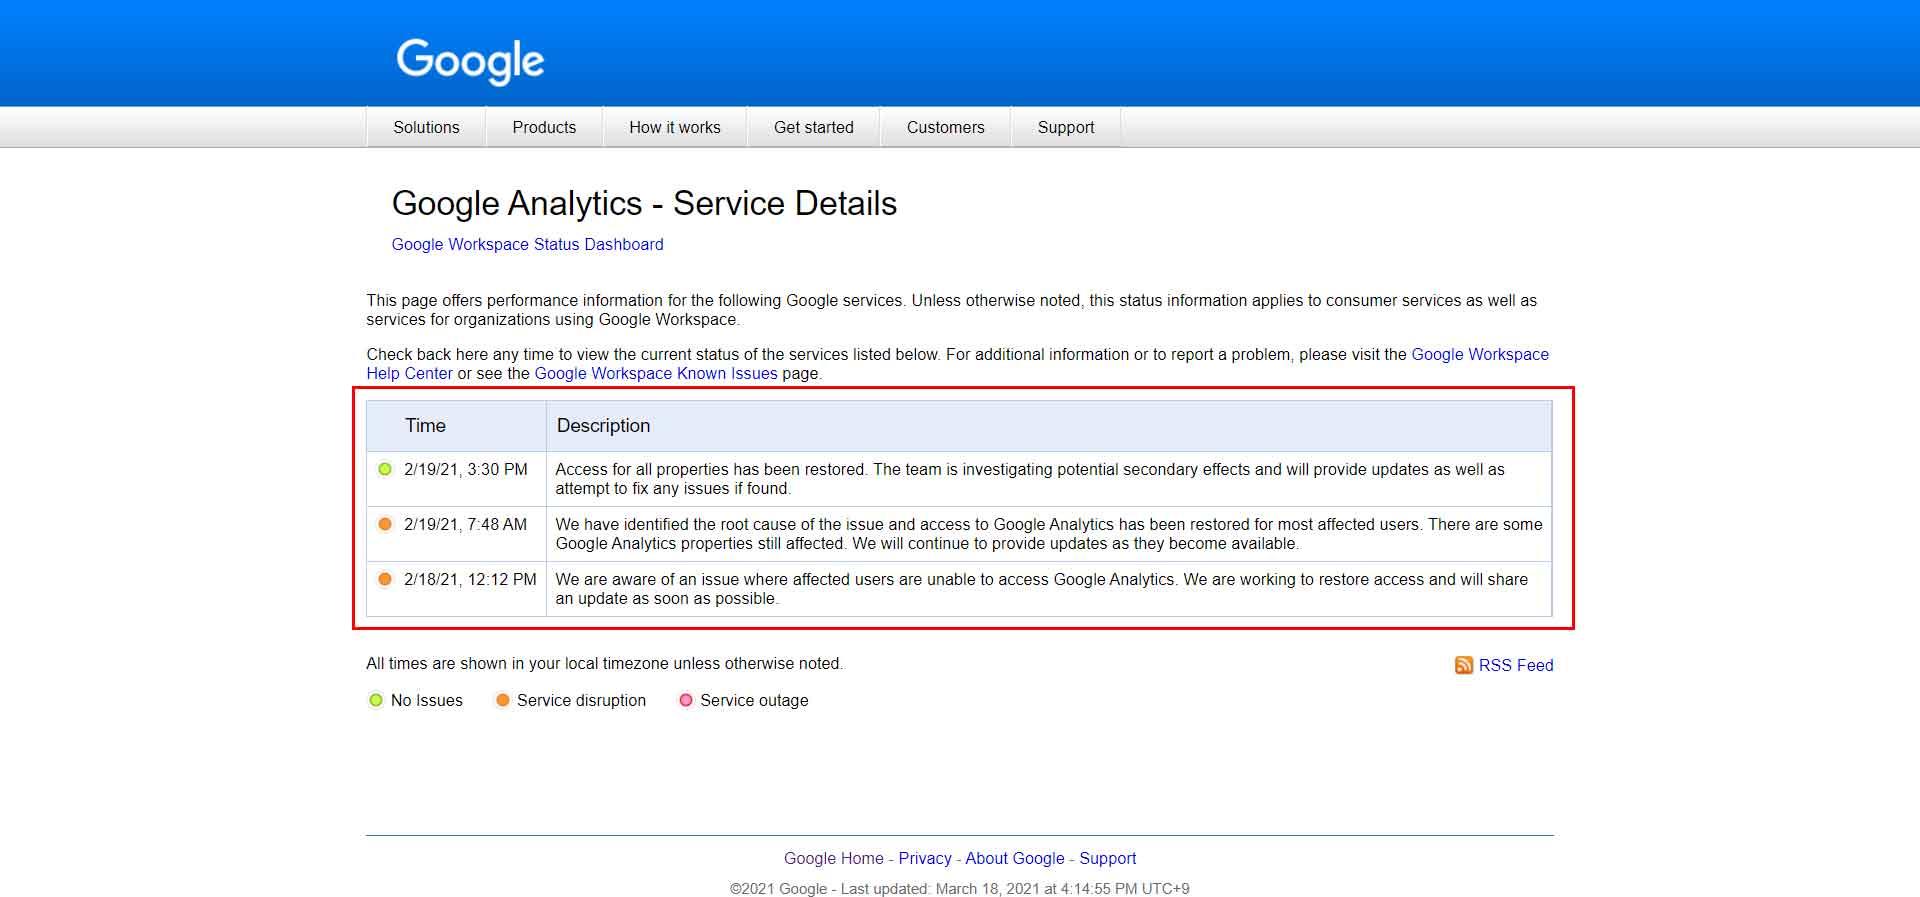 Googleサービスの障害情報と復旧状況を示す英語ページ